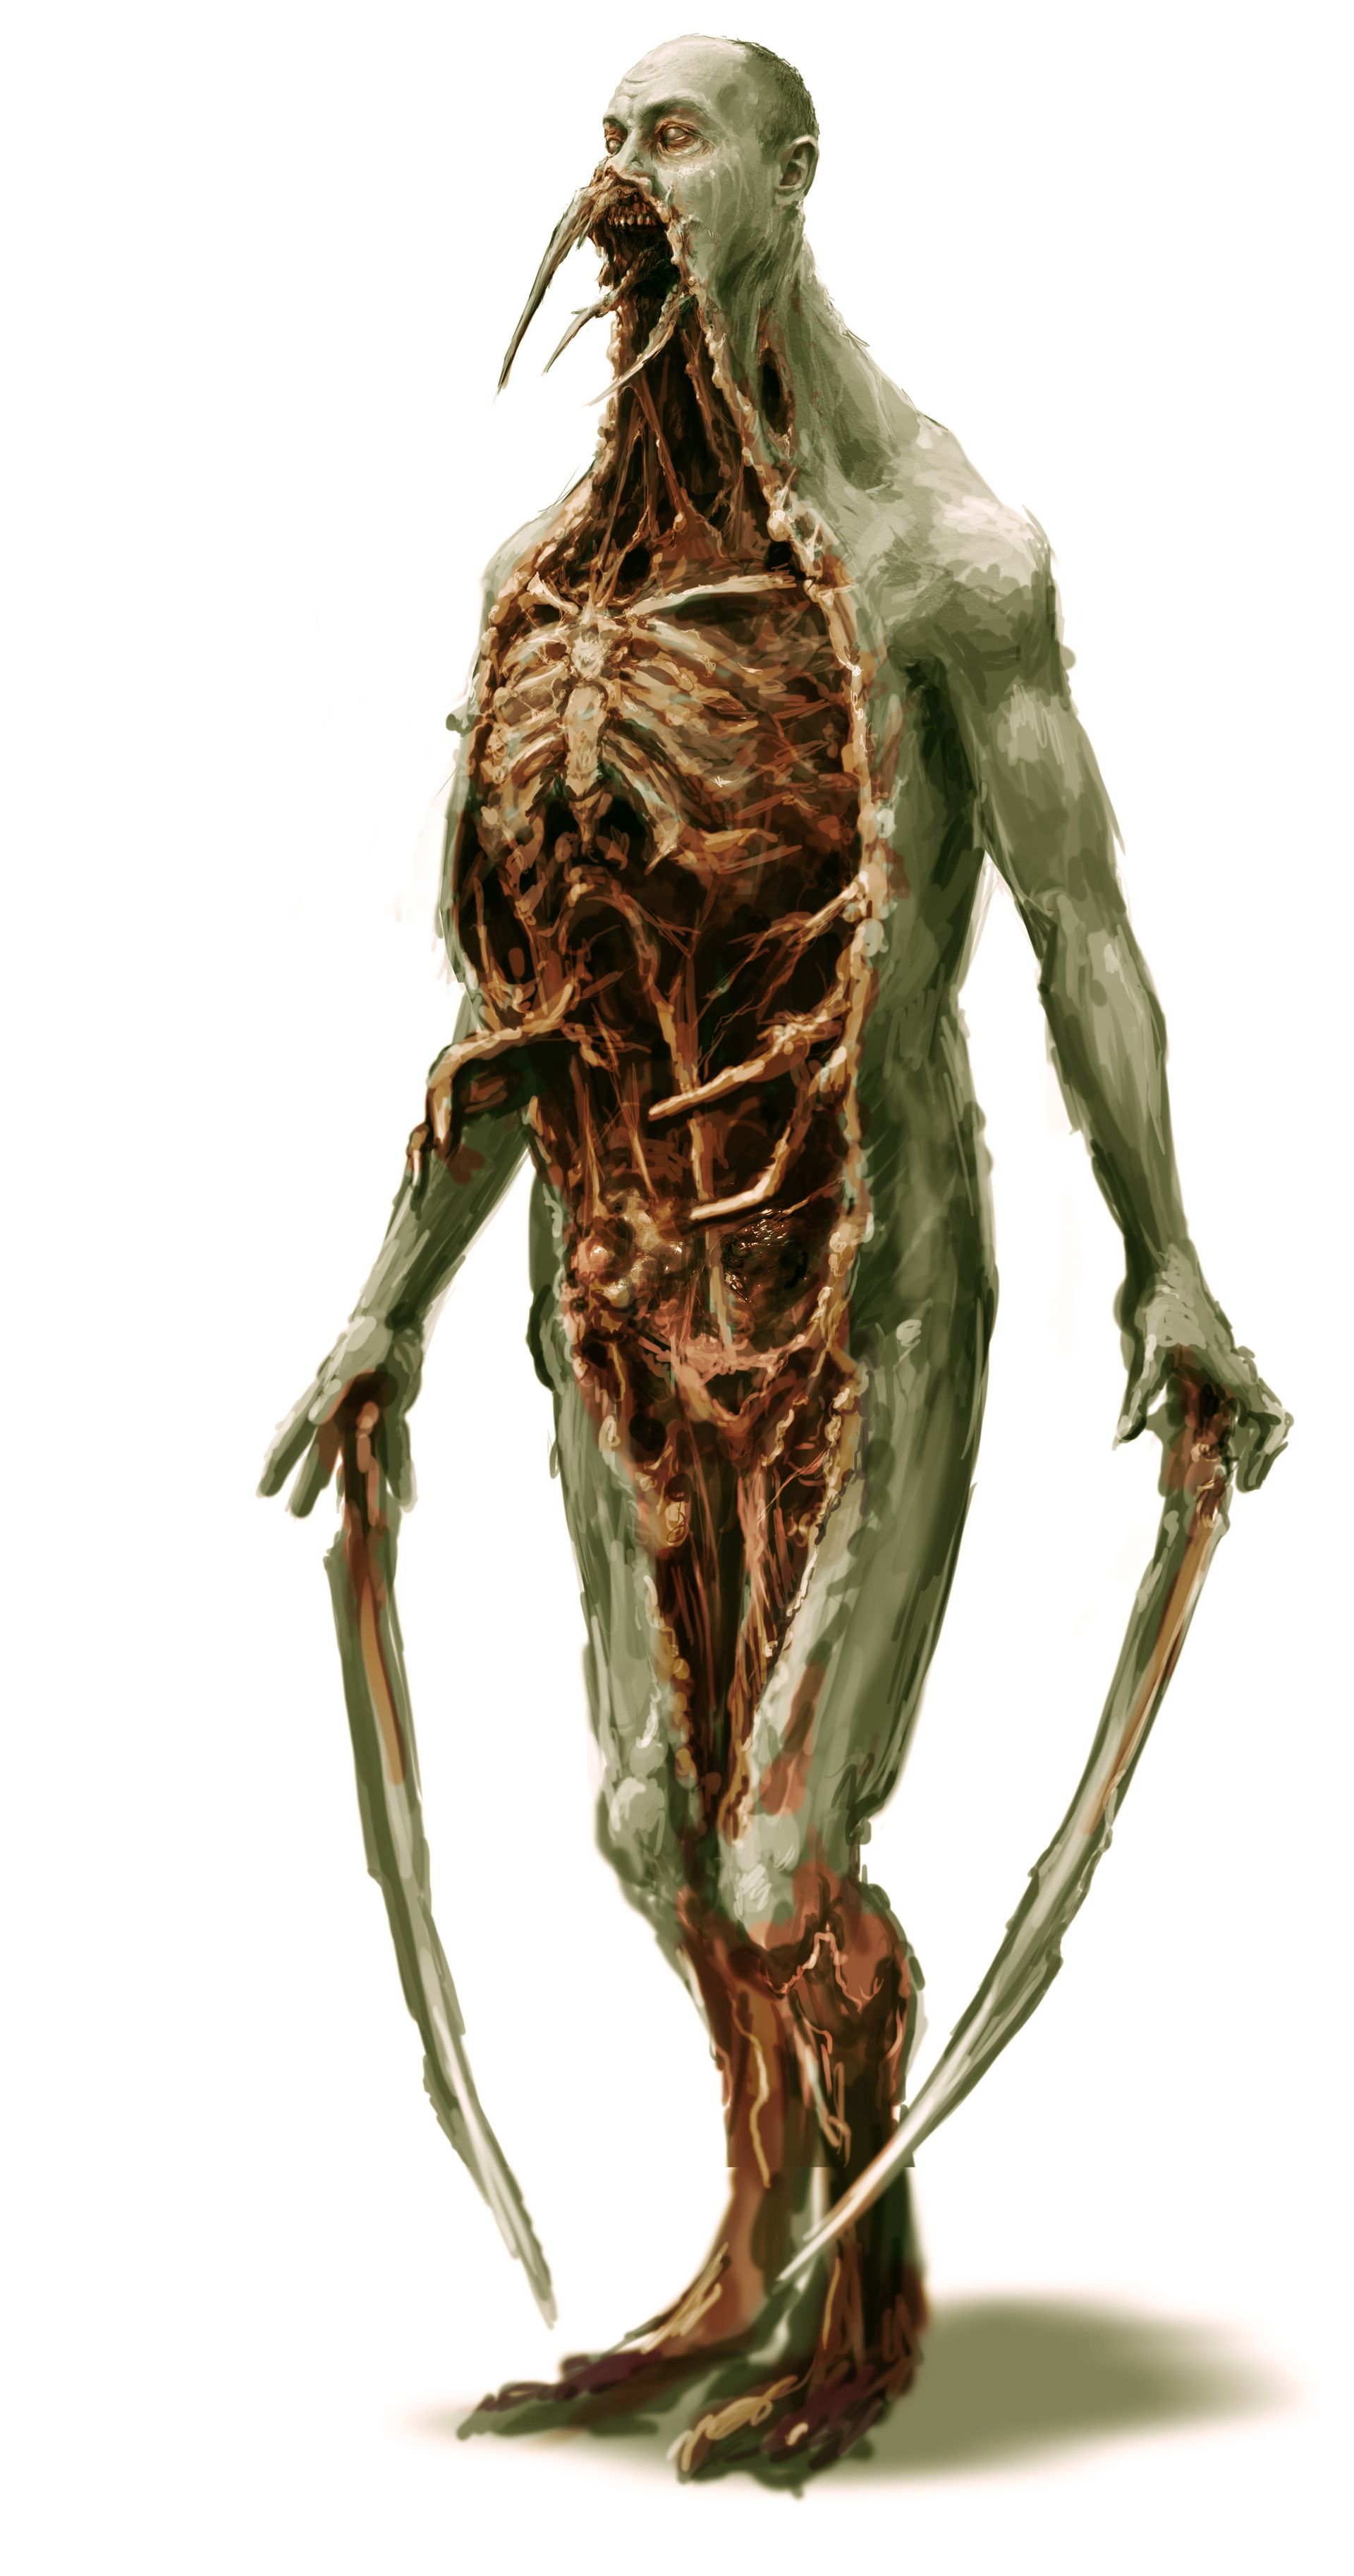 ArtStation - Dead Space, Ben Wanat   Creature Concept Art ... Dead Space 3 Monsters